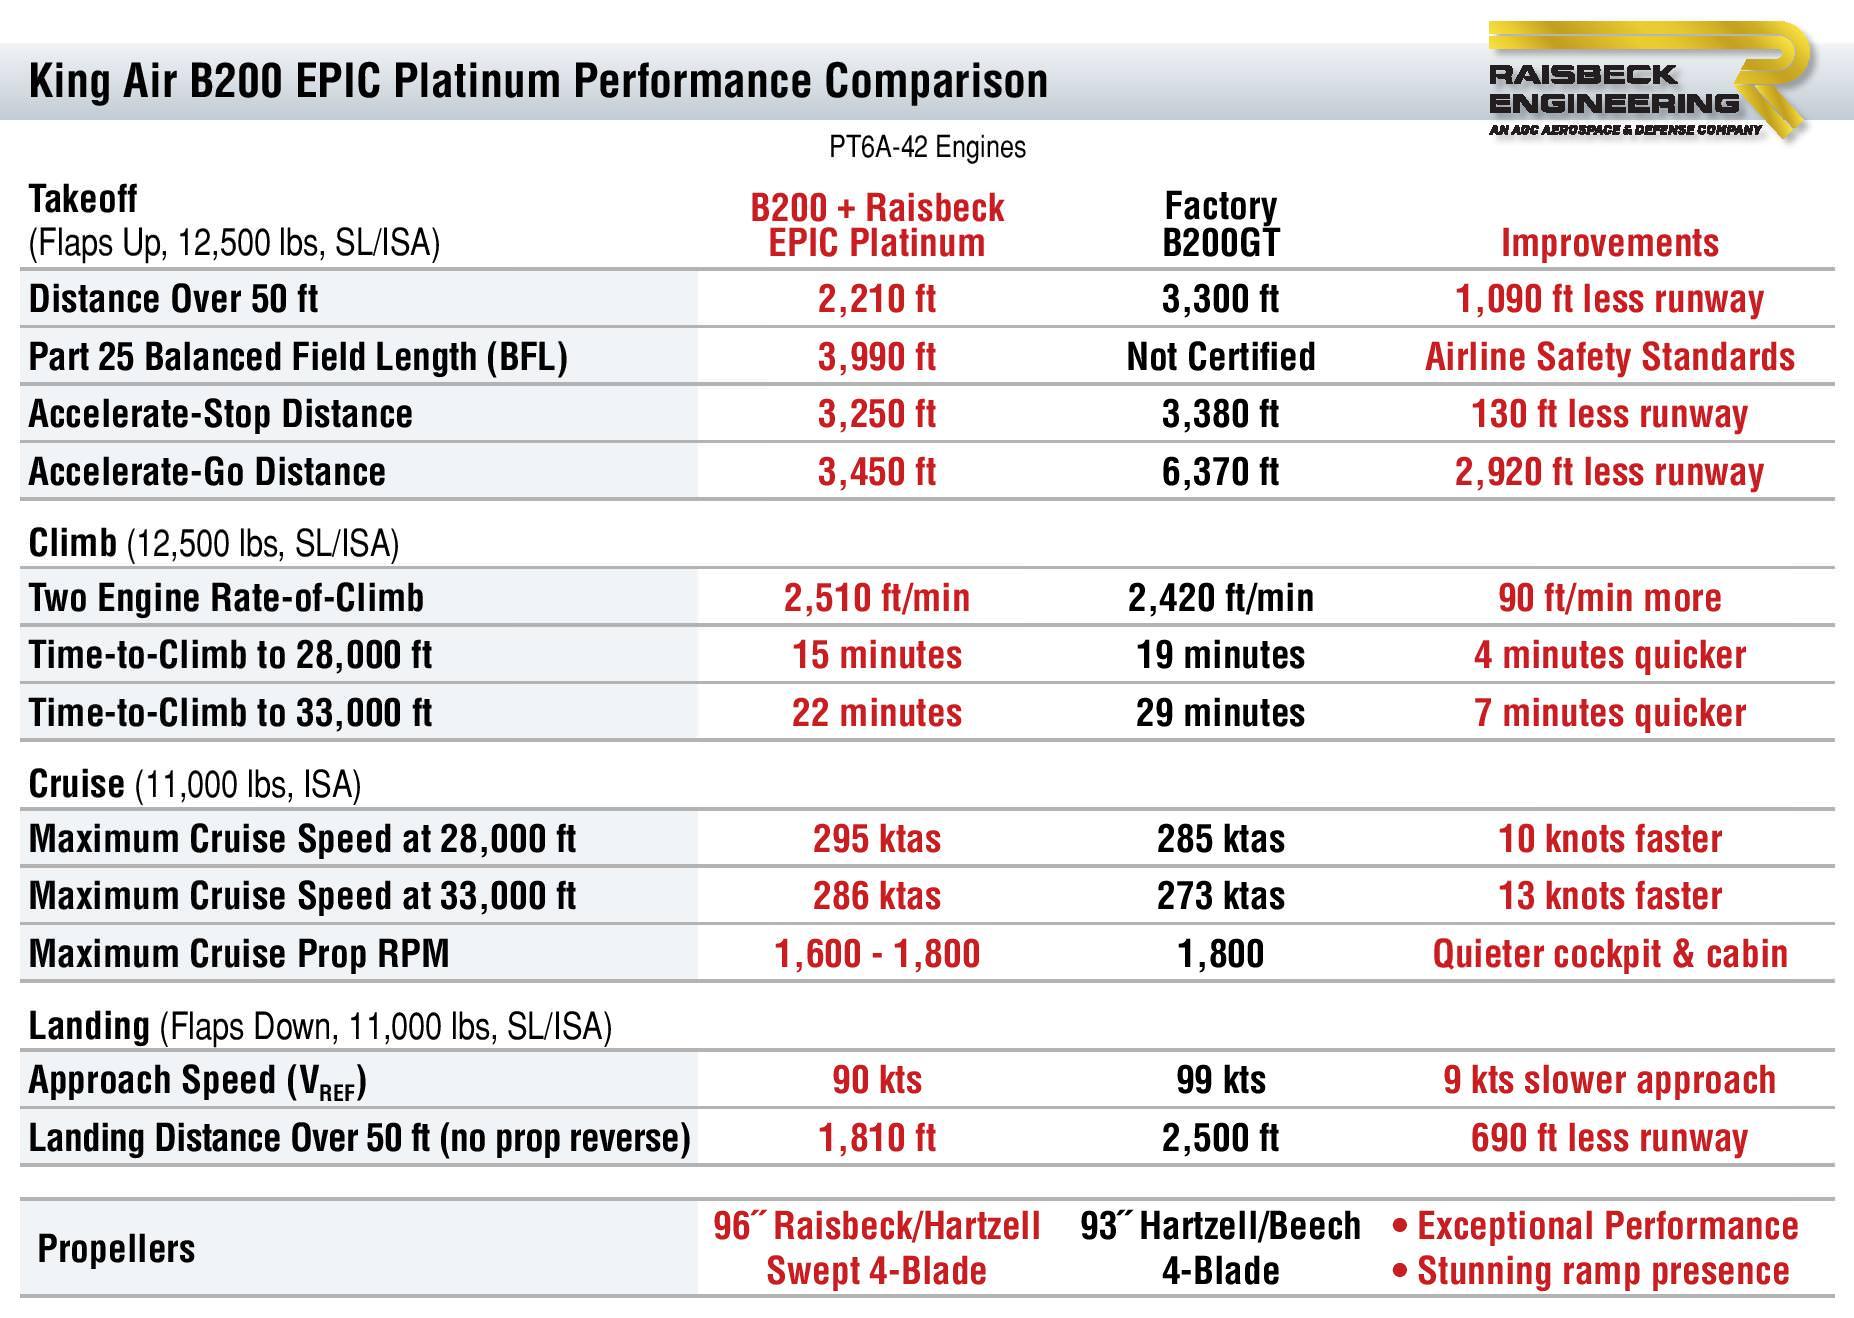 B200 EPIC Platinum Performance Table